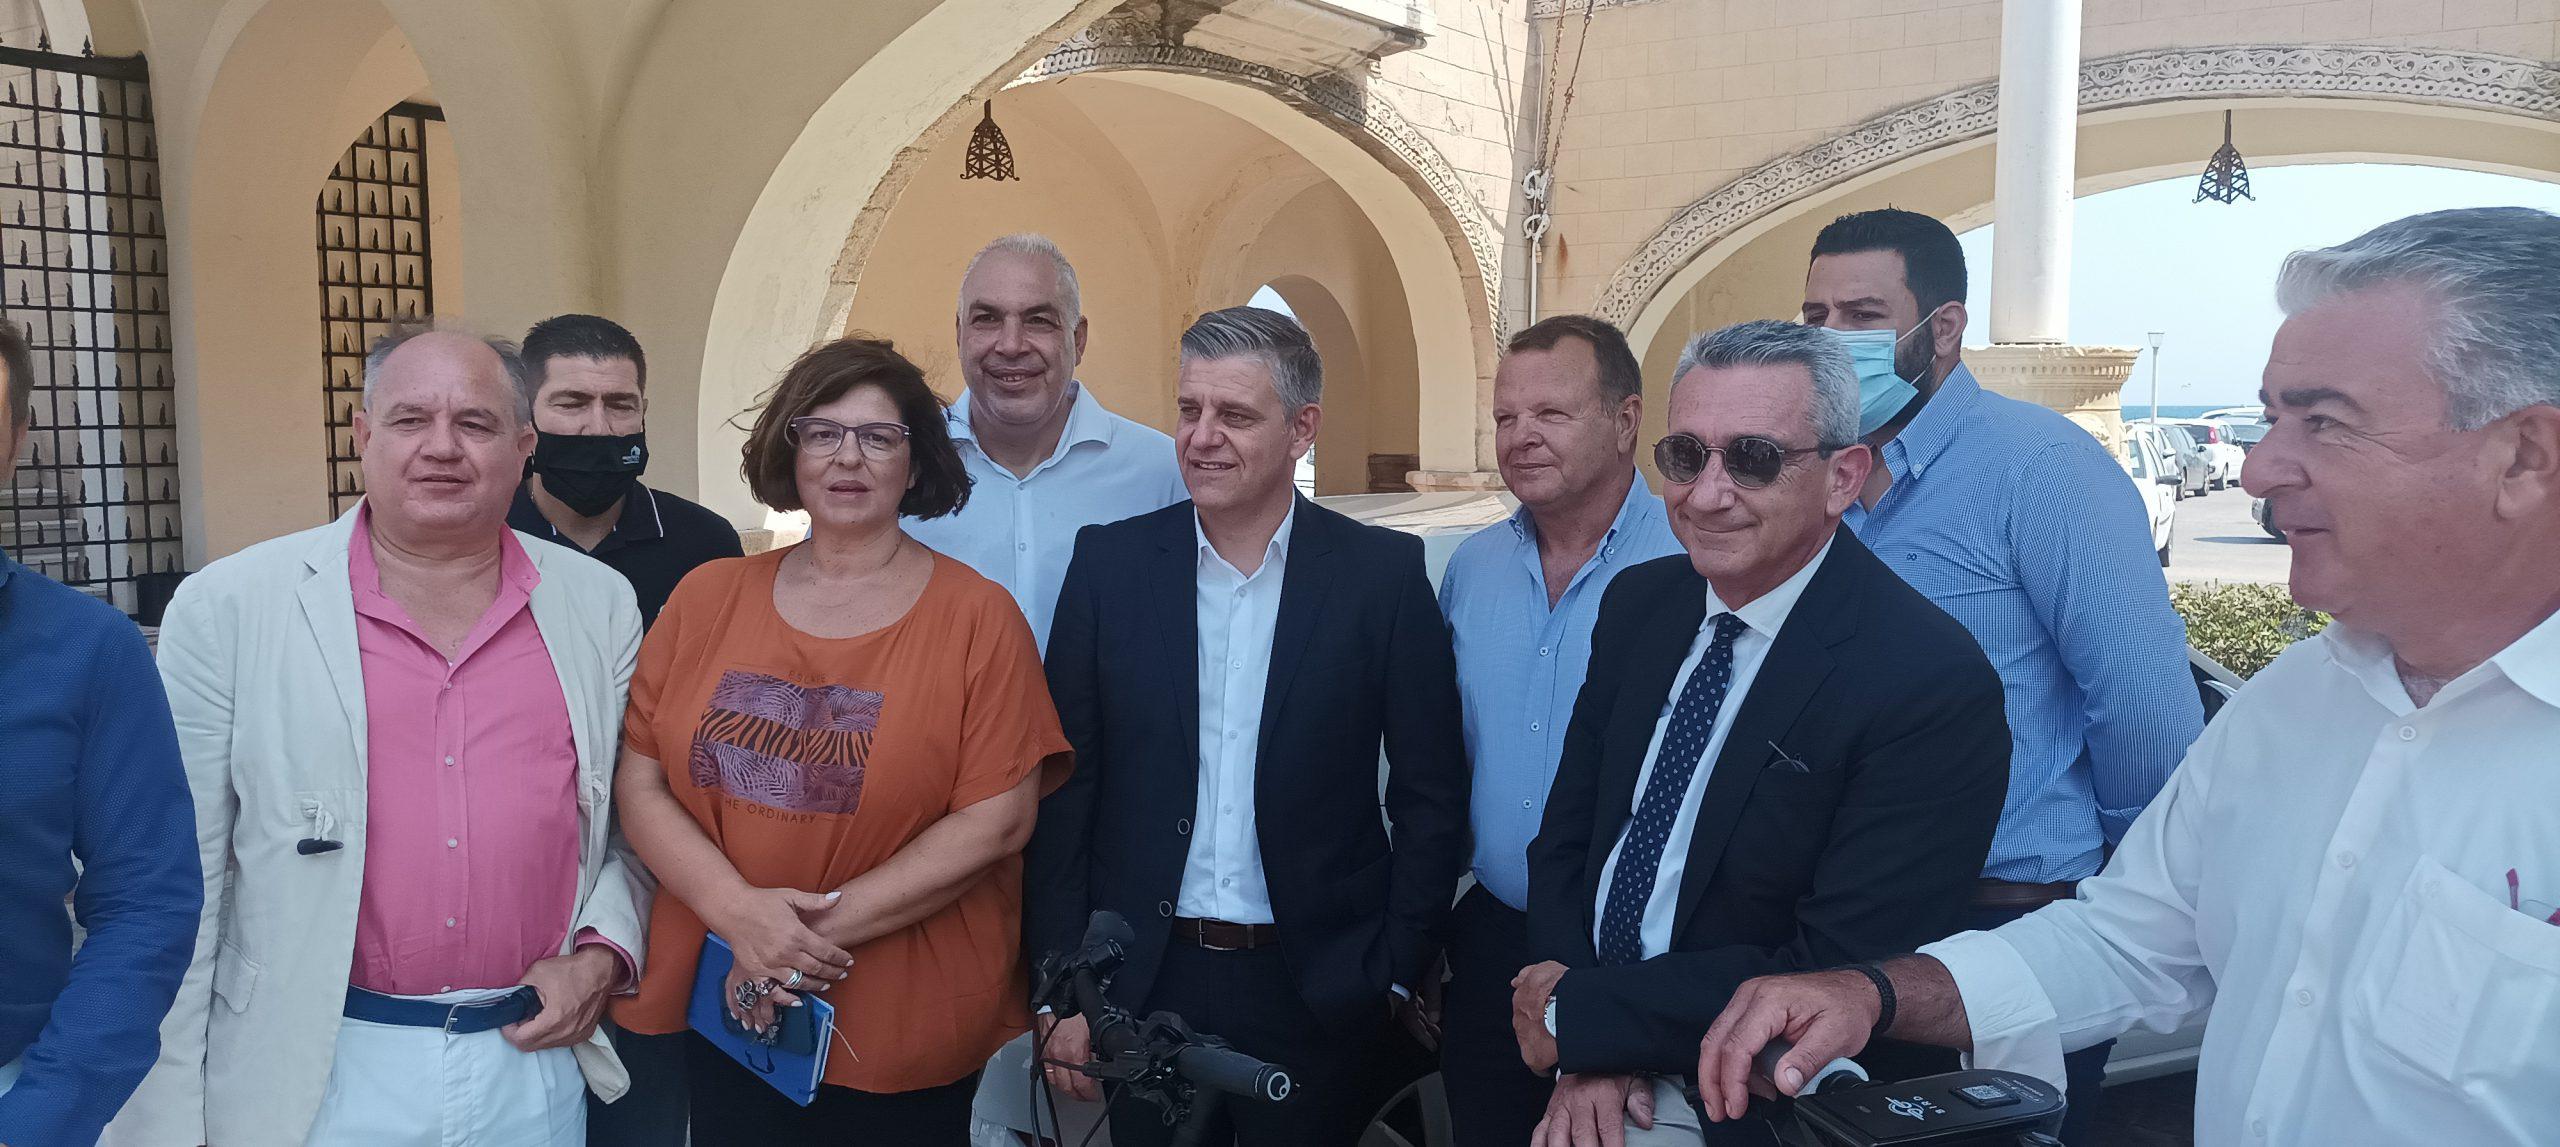 video Γιώργος Χατζημάρκος: «Στην Περιφέρεια Νοτίου Αιγαίου, δεν είμαστε απαθείς θεατές. Έχουμε επιλέξει να είμαστε διαμορφωτές των εξελίξεων»